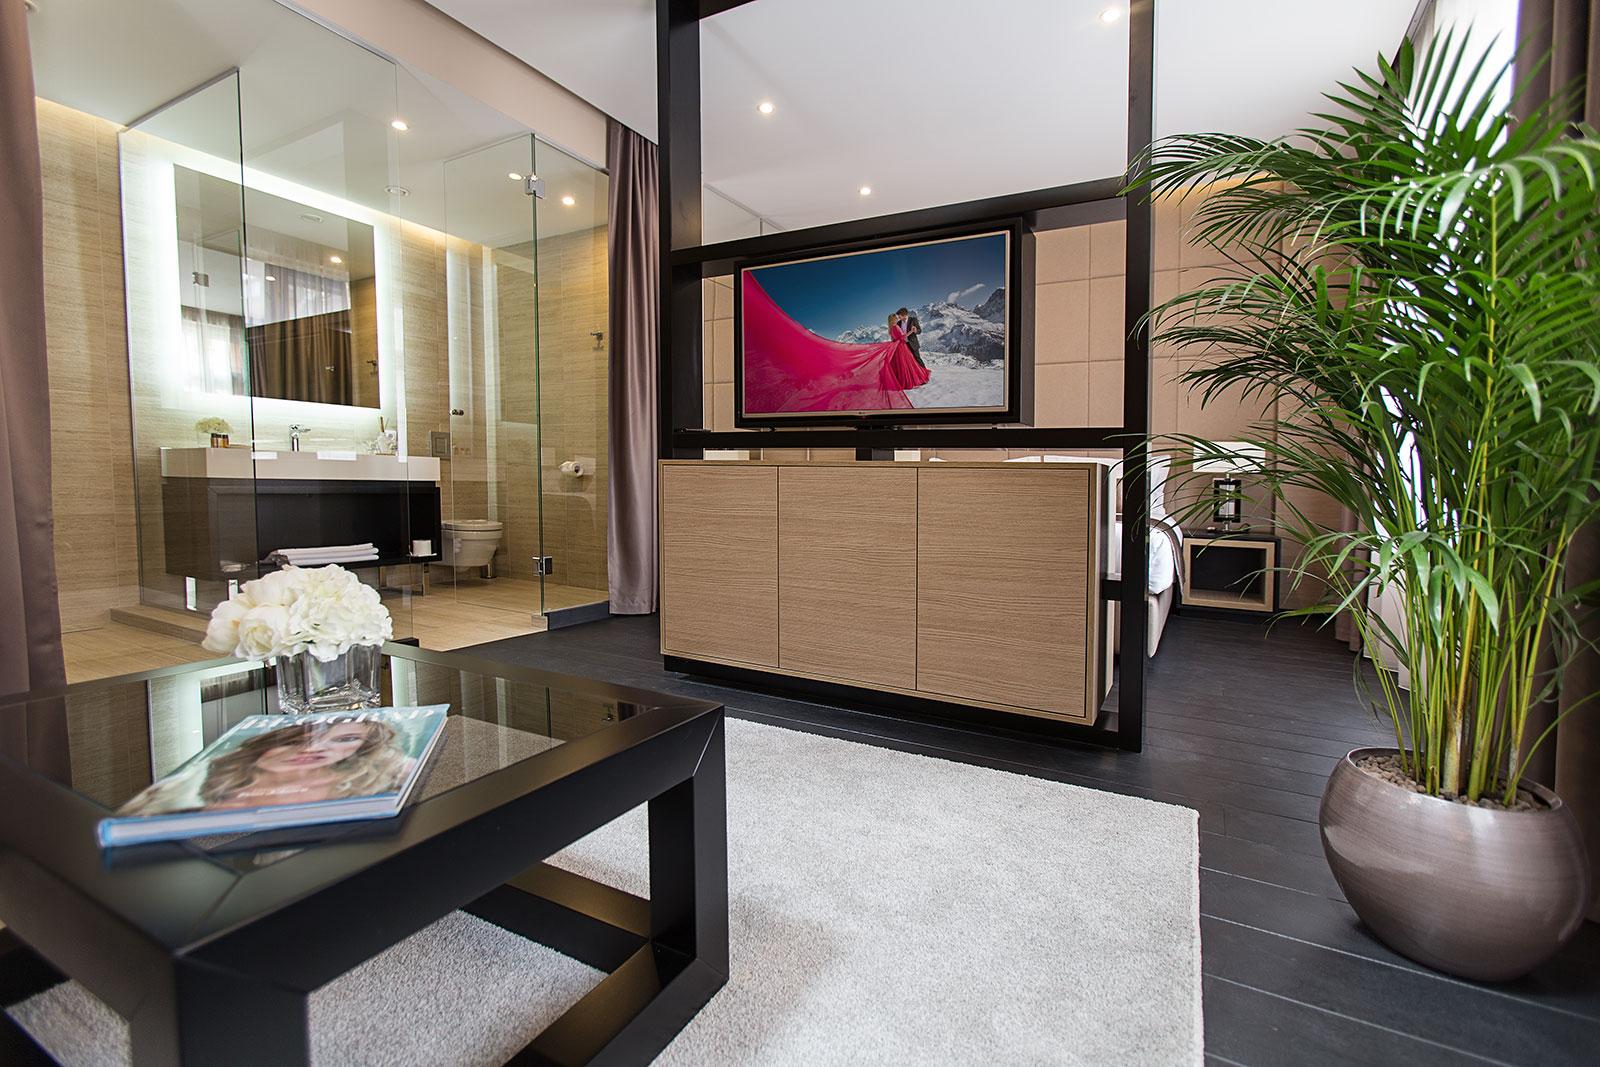 dominic, luxury, suites, beograd, apartmani, mirko nahmijas, pecatipotpis, pecat i potpis